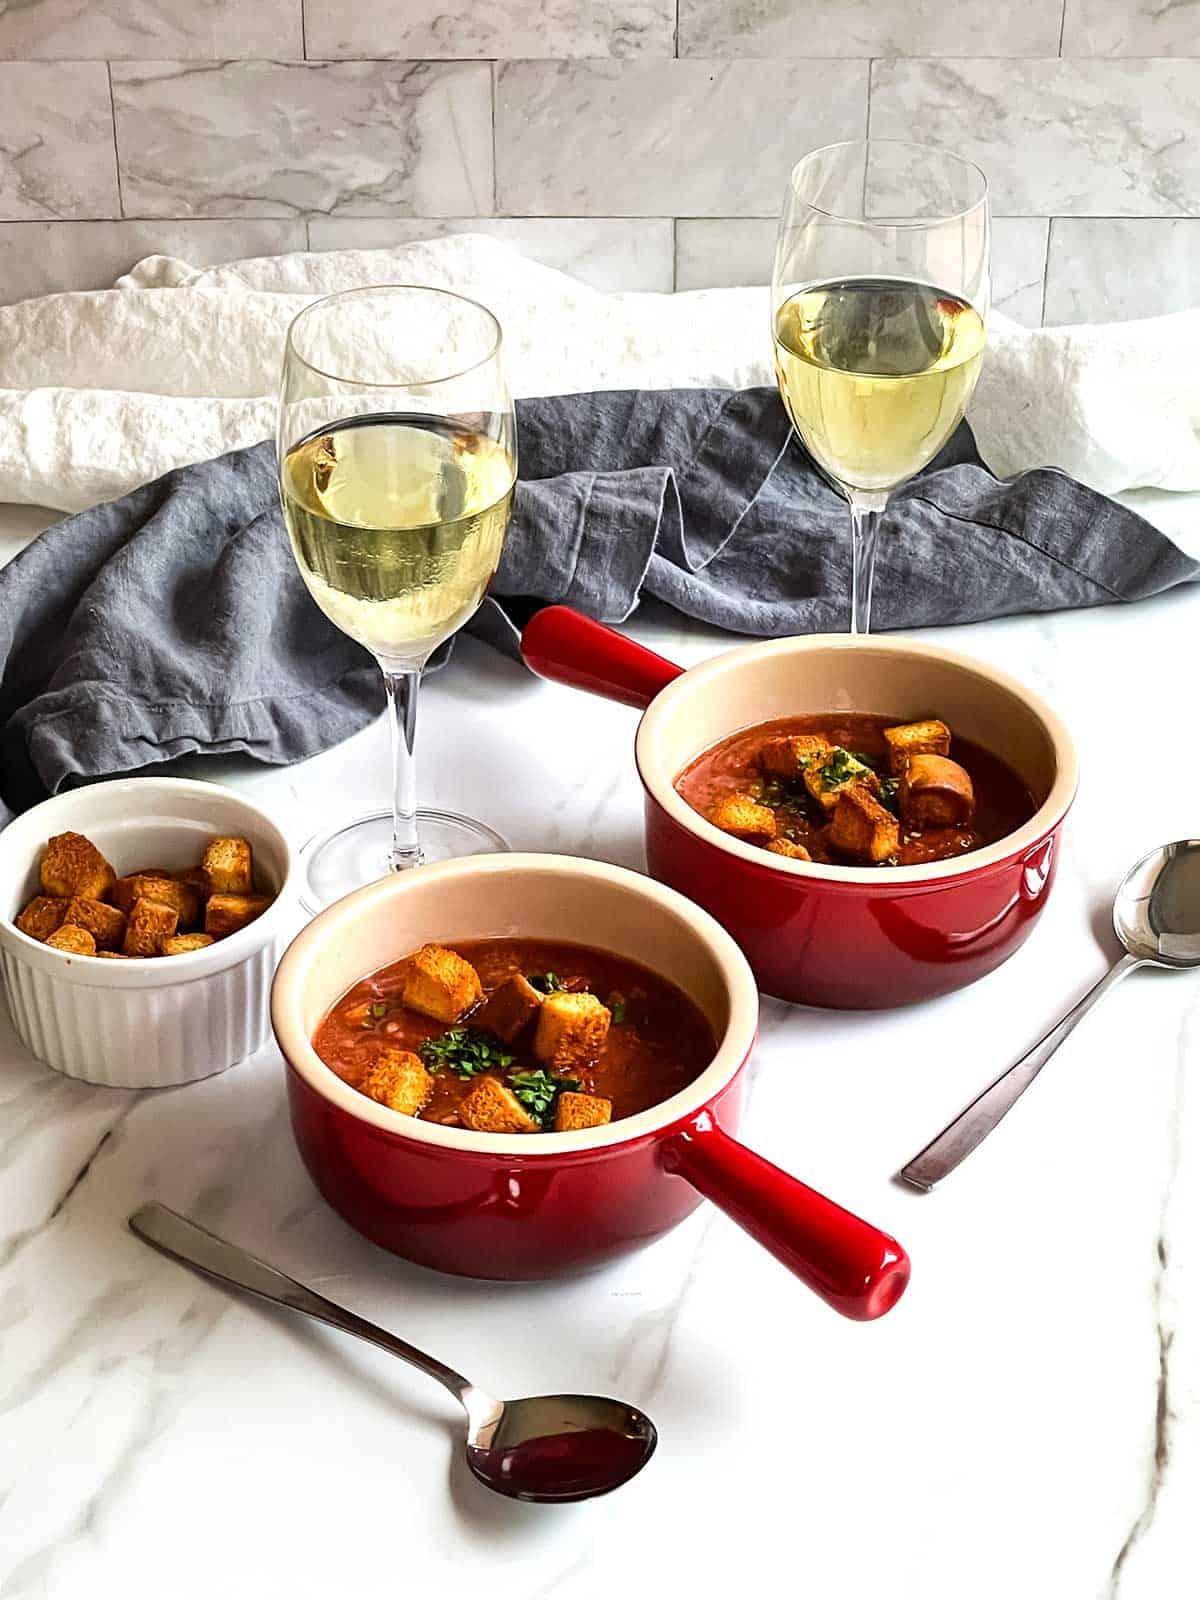 Gazpacho Soup with garlic croutons.